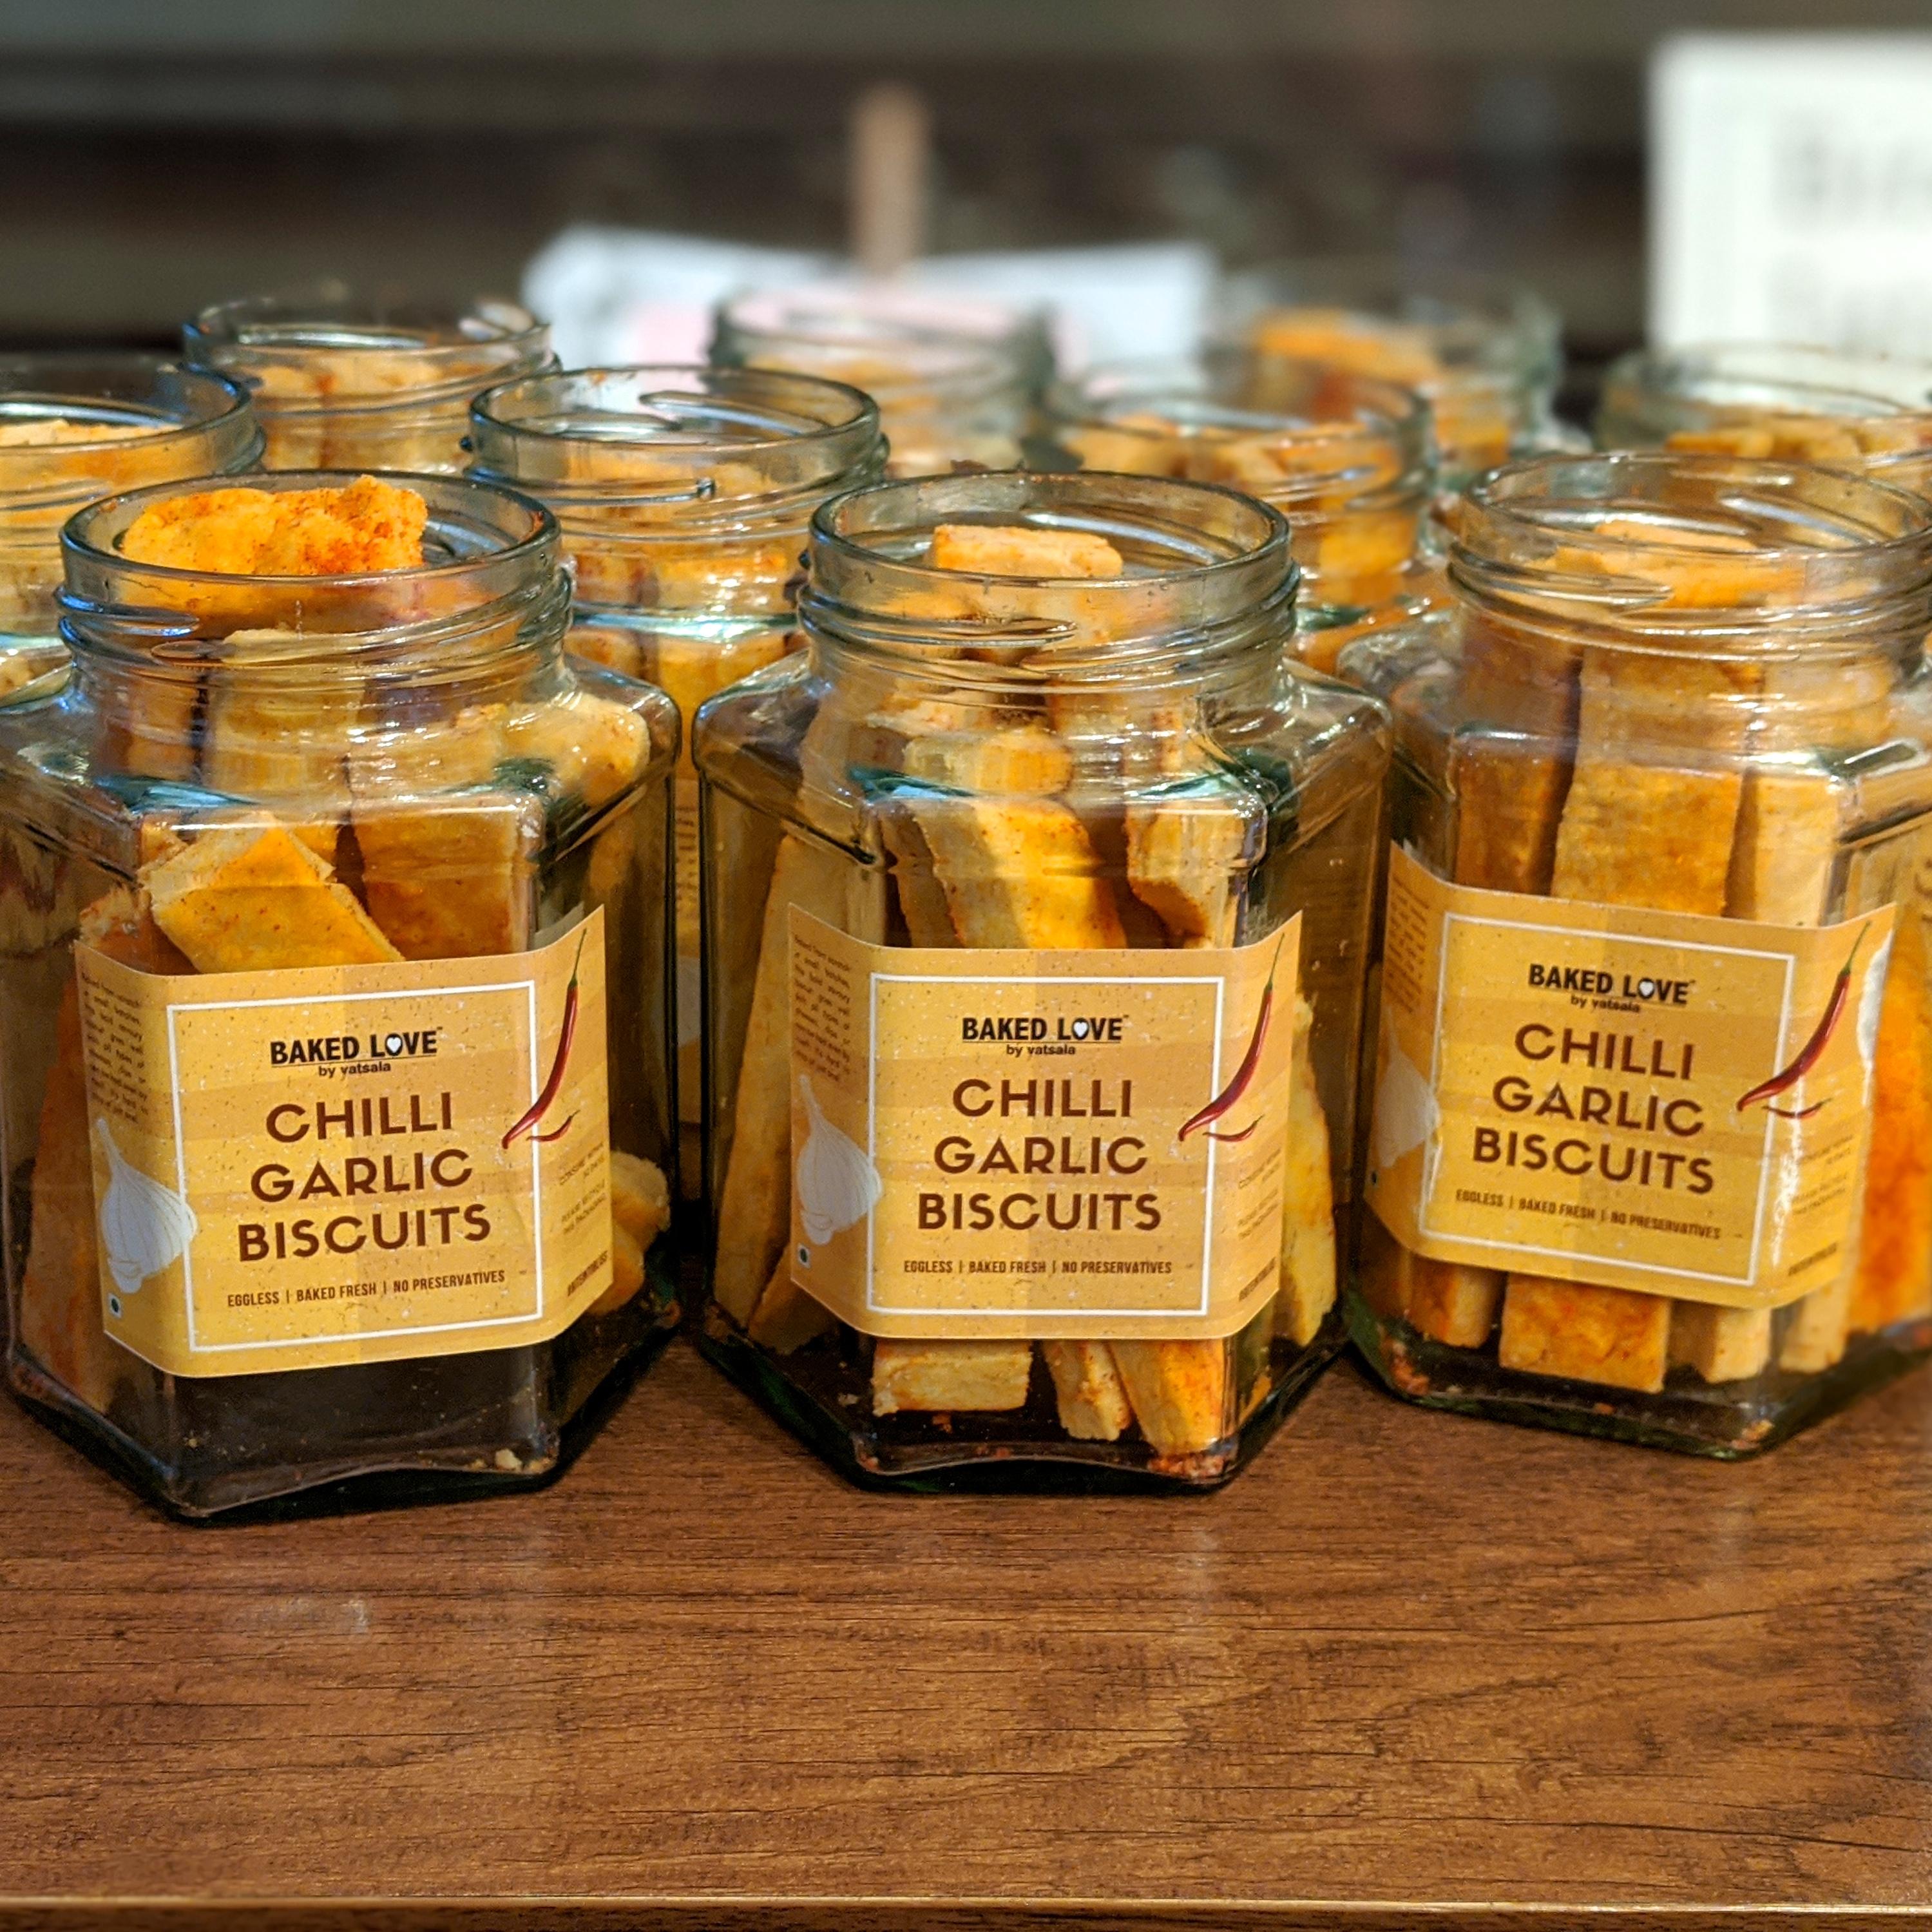 Chilli Garlic Biscuits copy